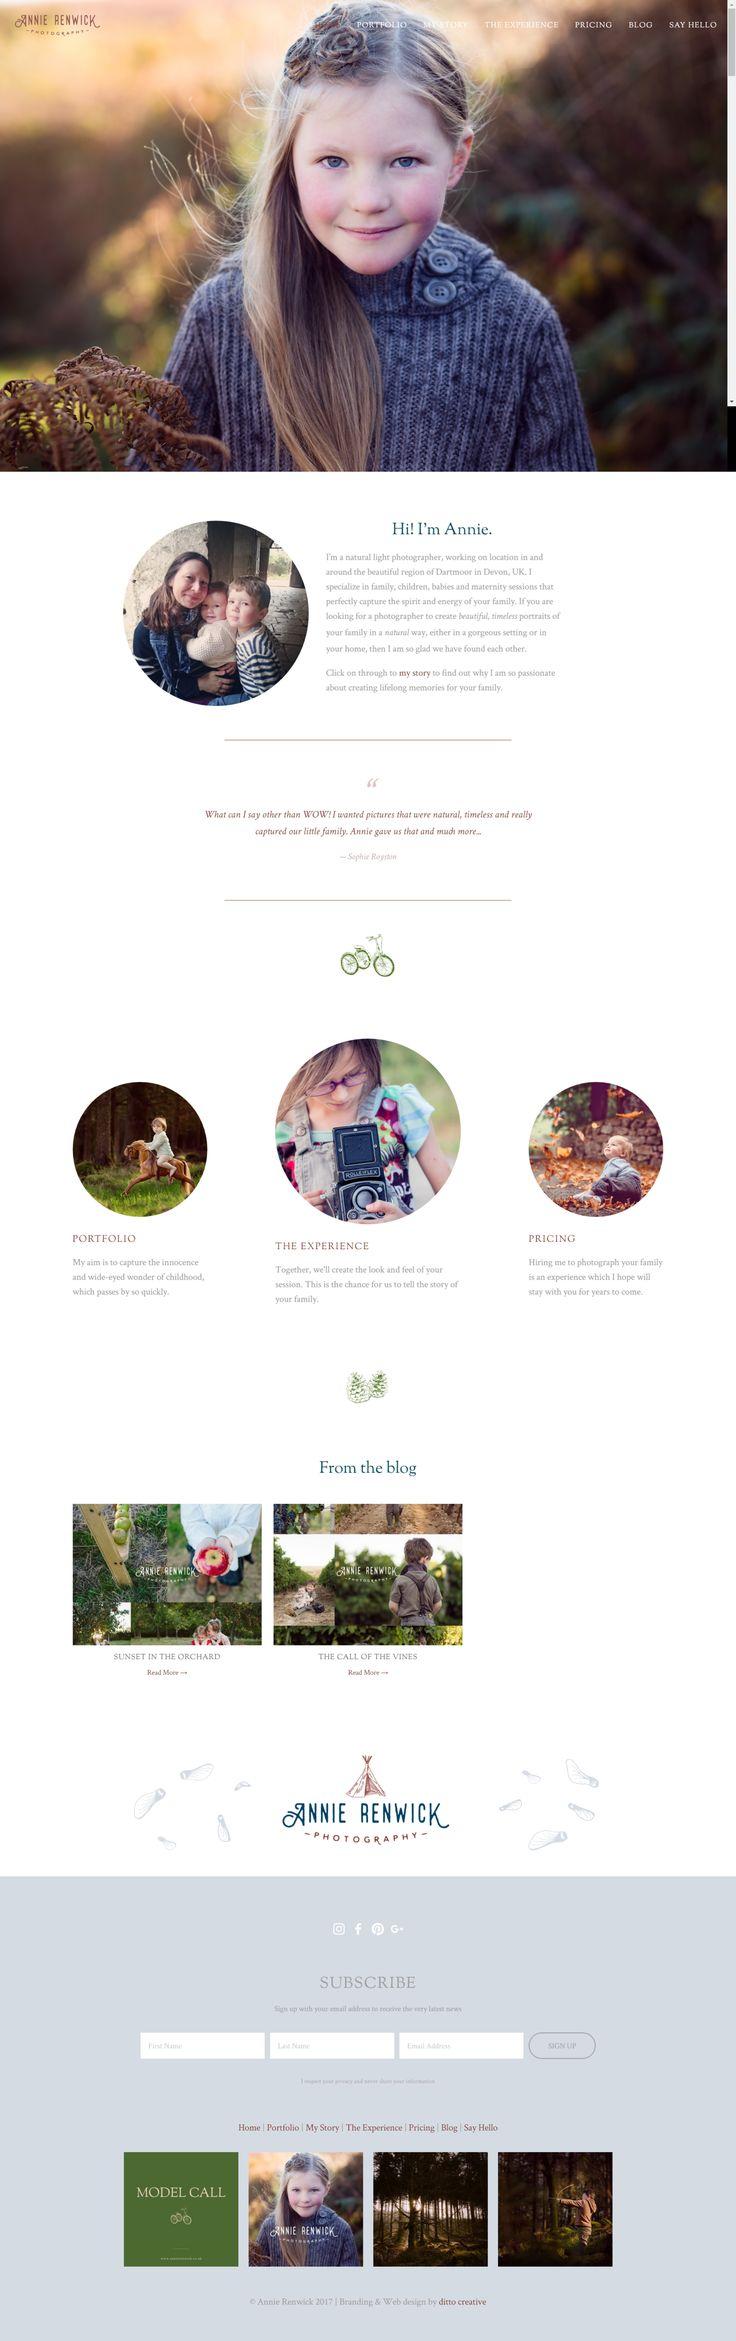 Annie Renwick fine art childrens photographer website design by Ditto Creative, branding agency in Kent, squarespace web design